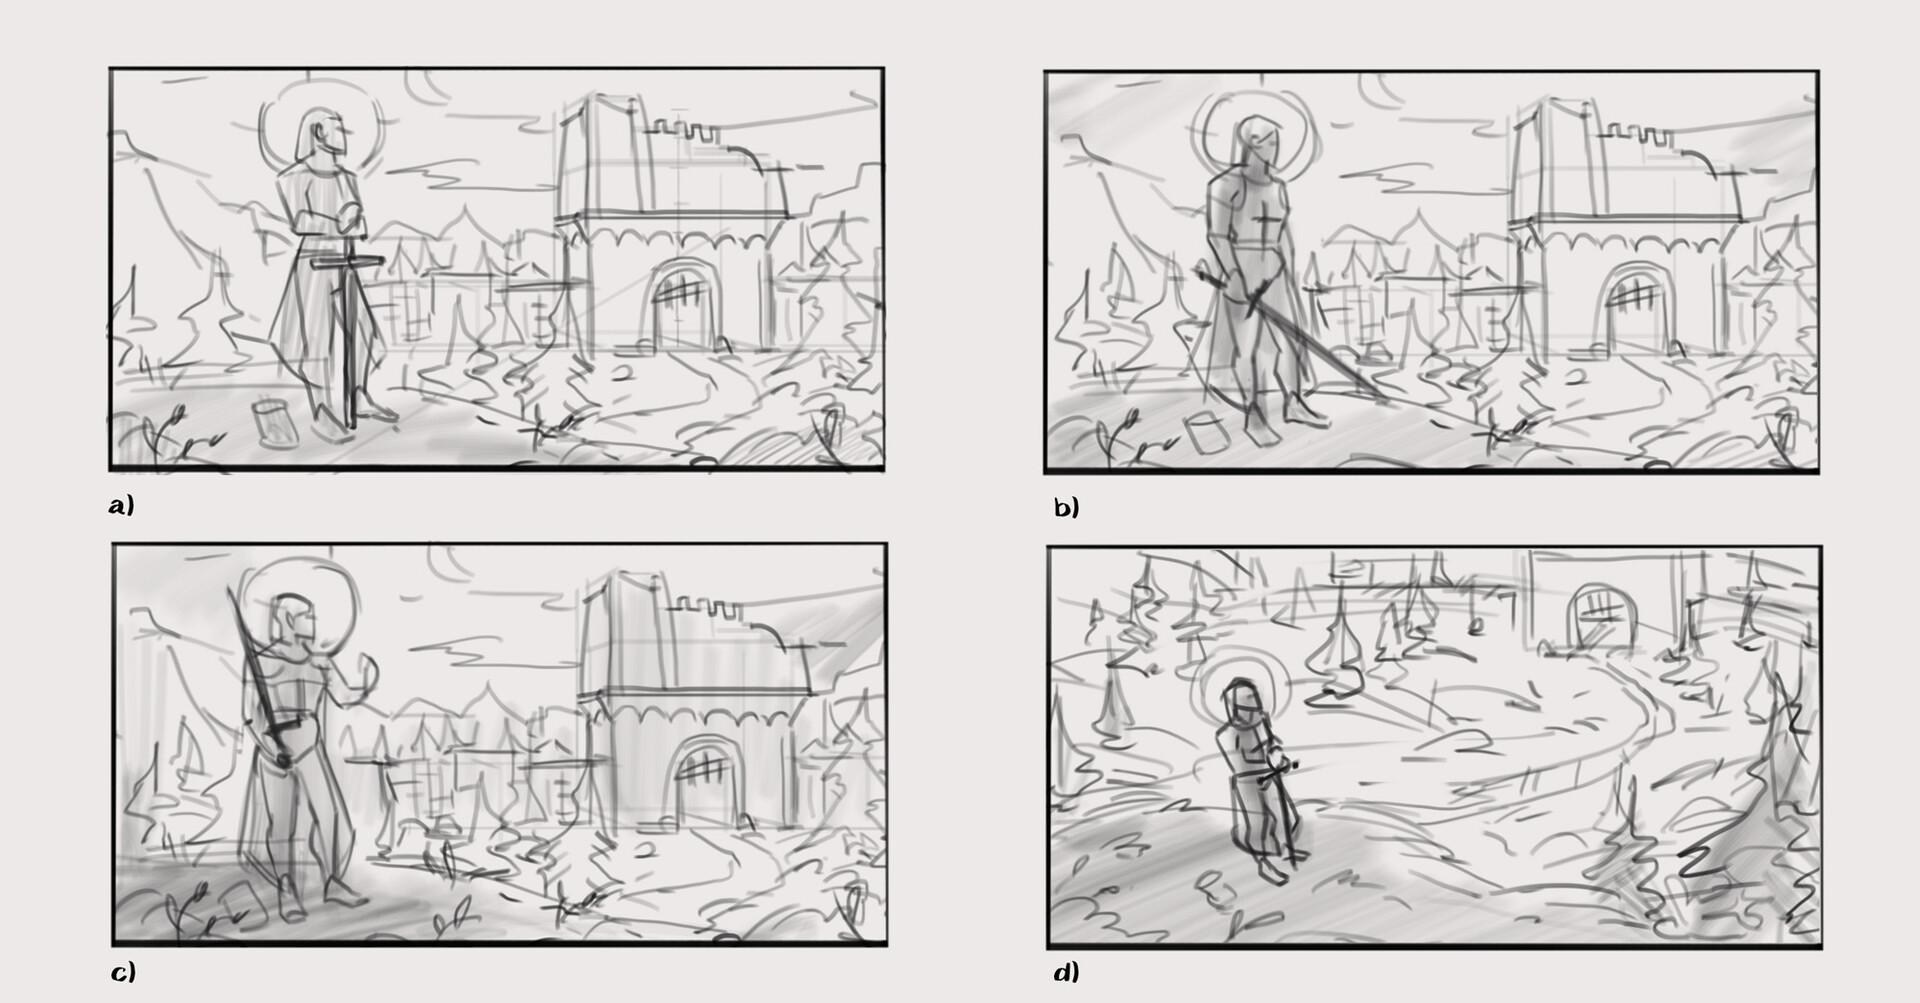 Janna sophia oochie thumbnail sketches